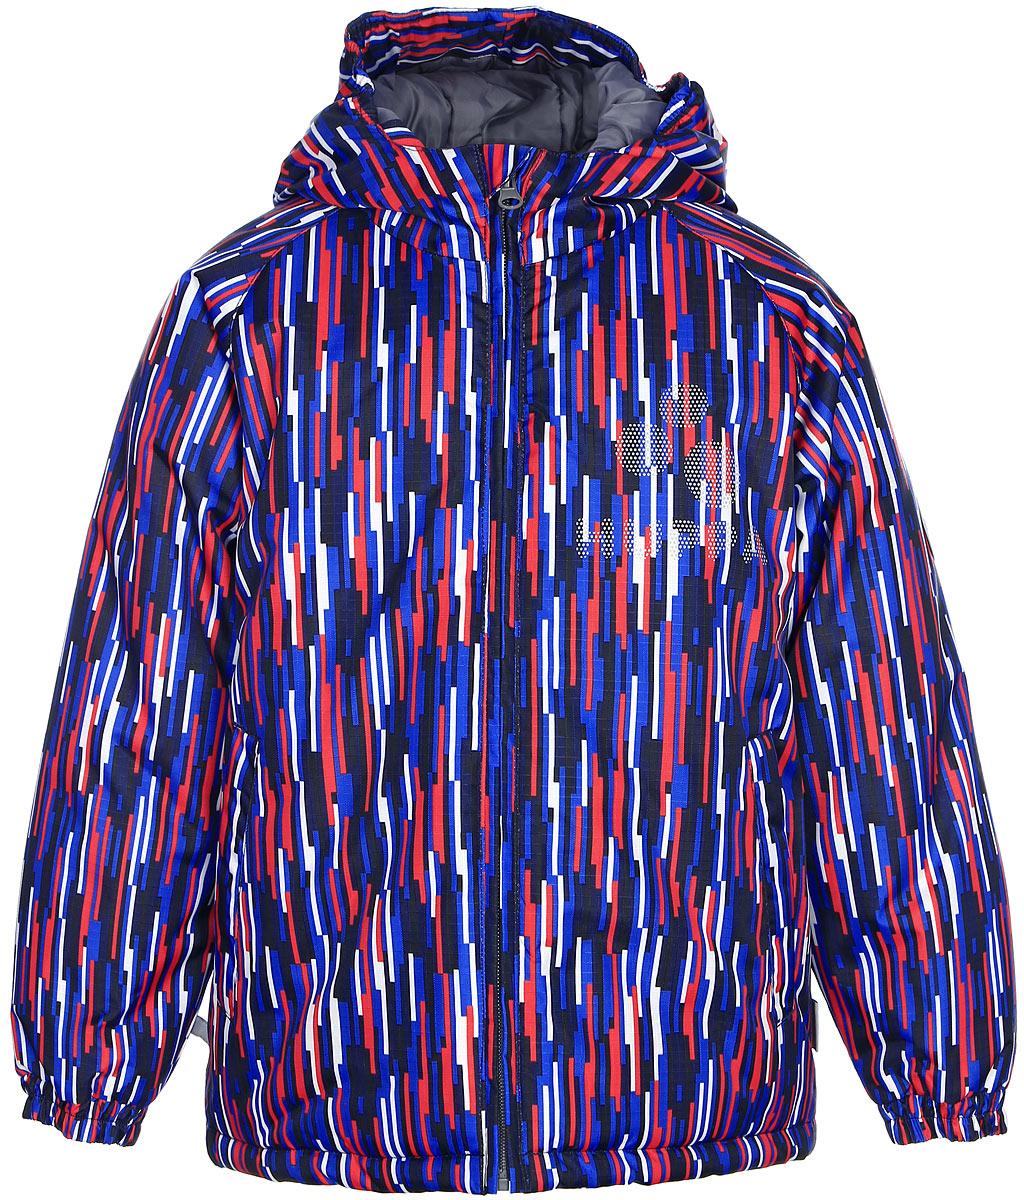 Фото Куртка детская Huppa Classy, цвет: темно-синий. 17710030-586. Размер 152